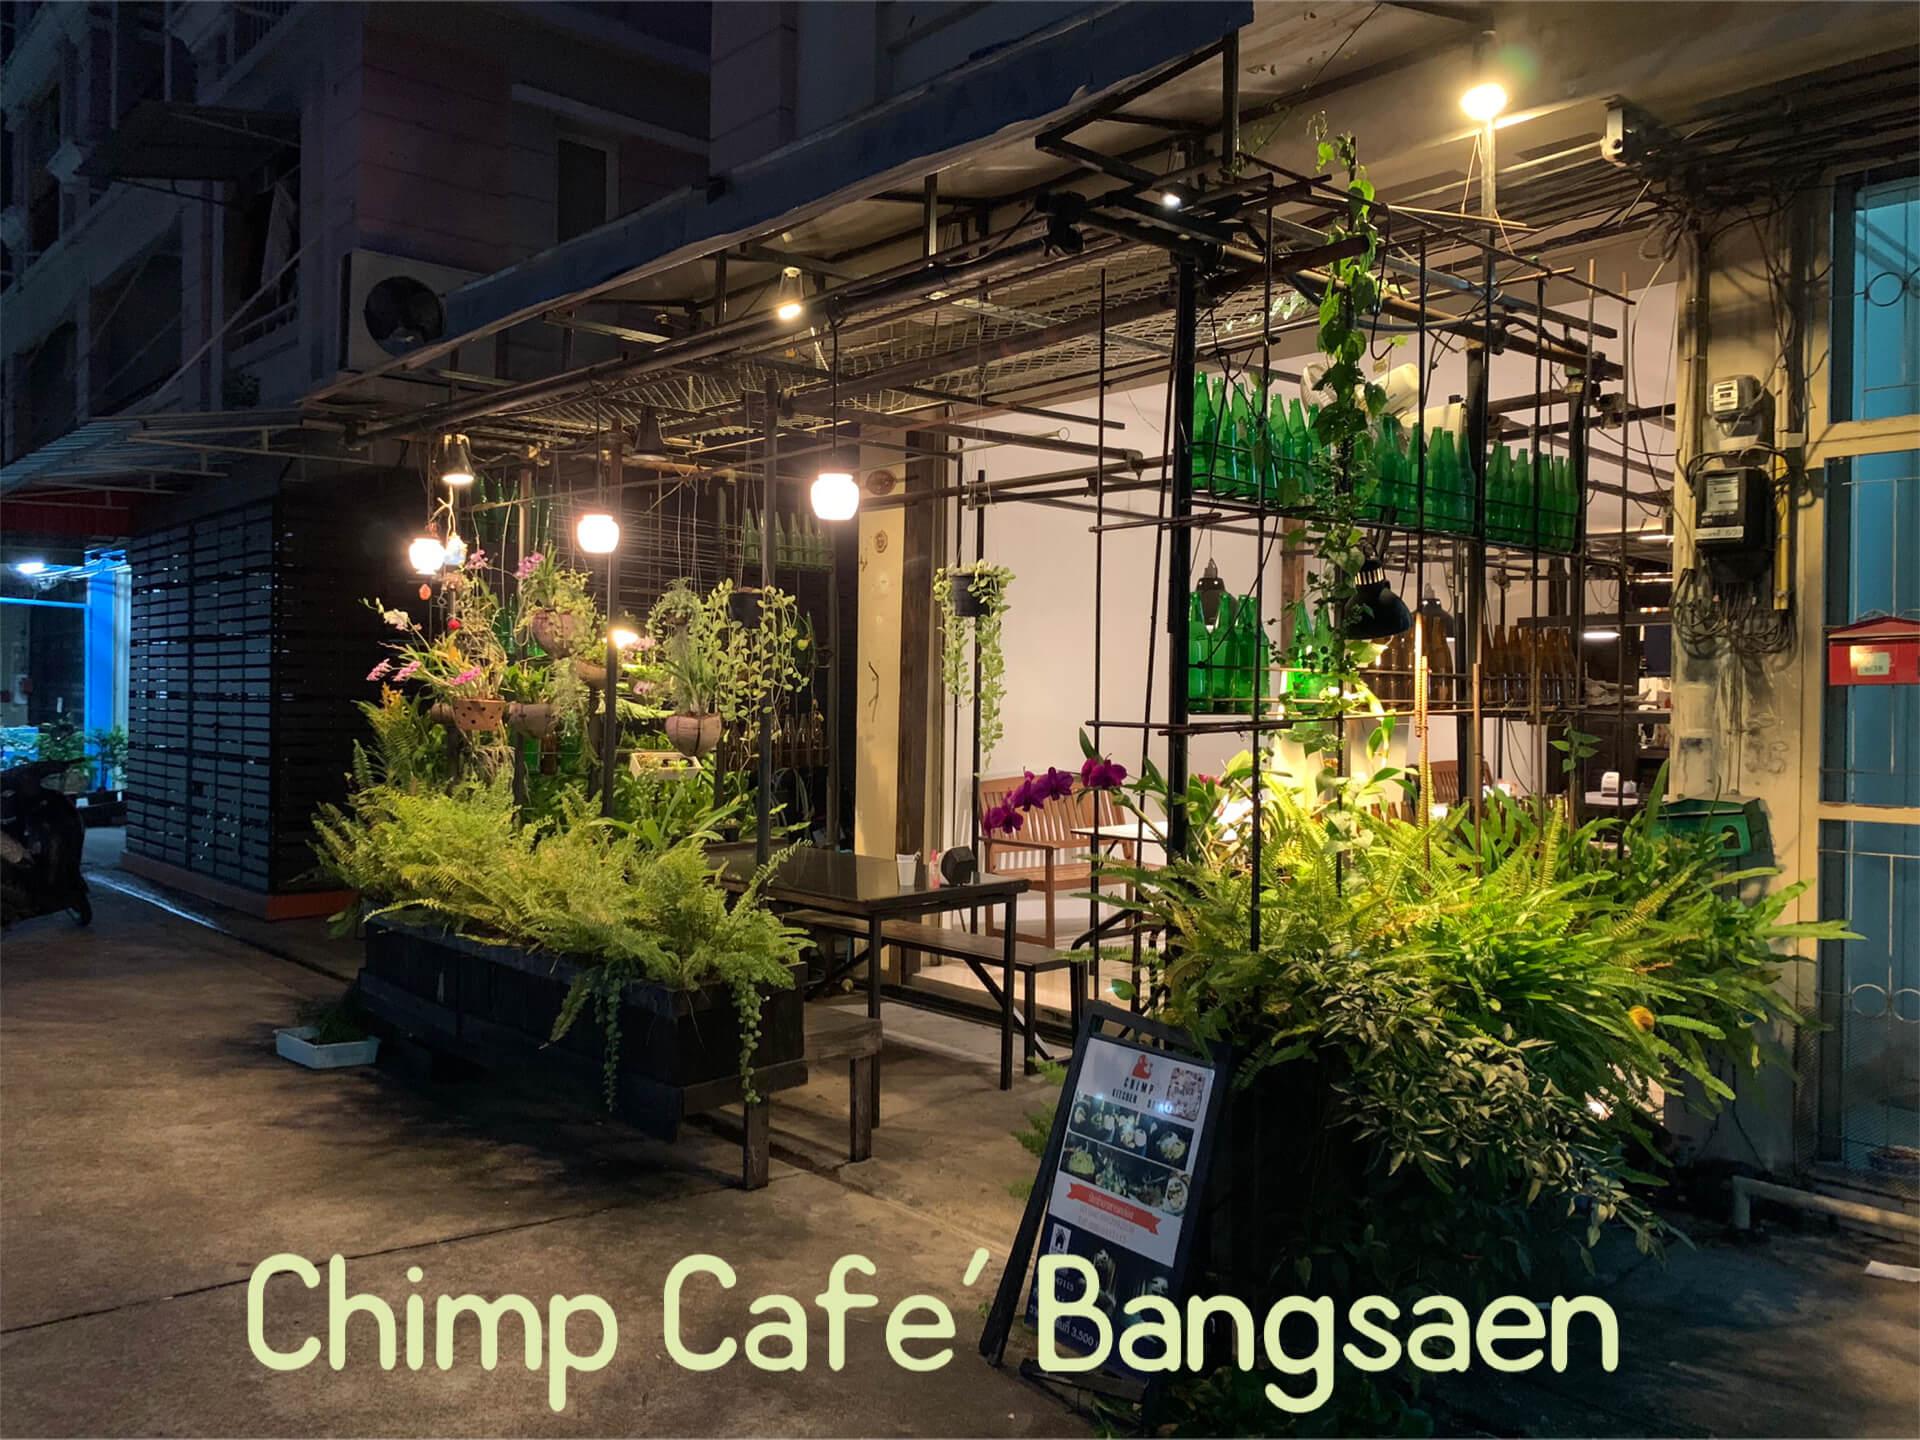 Chimp Café  ร้านกาแฟสุดชิค บางแสน